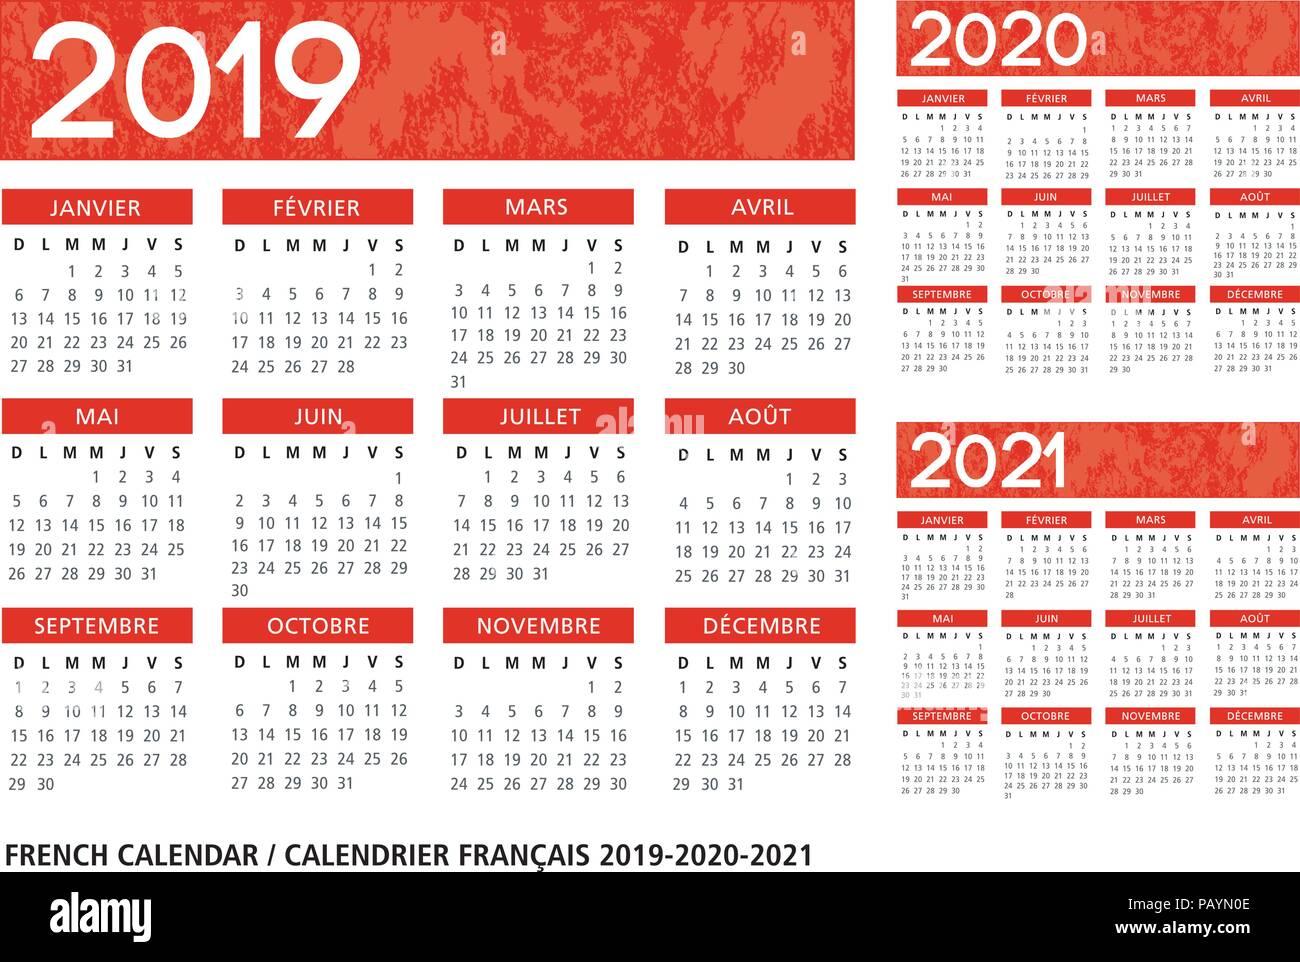 Template Calendrier 2019.French Language Orange Textured Calendar 2019 2020 2021